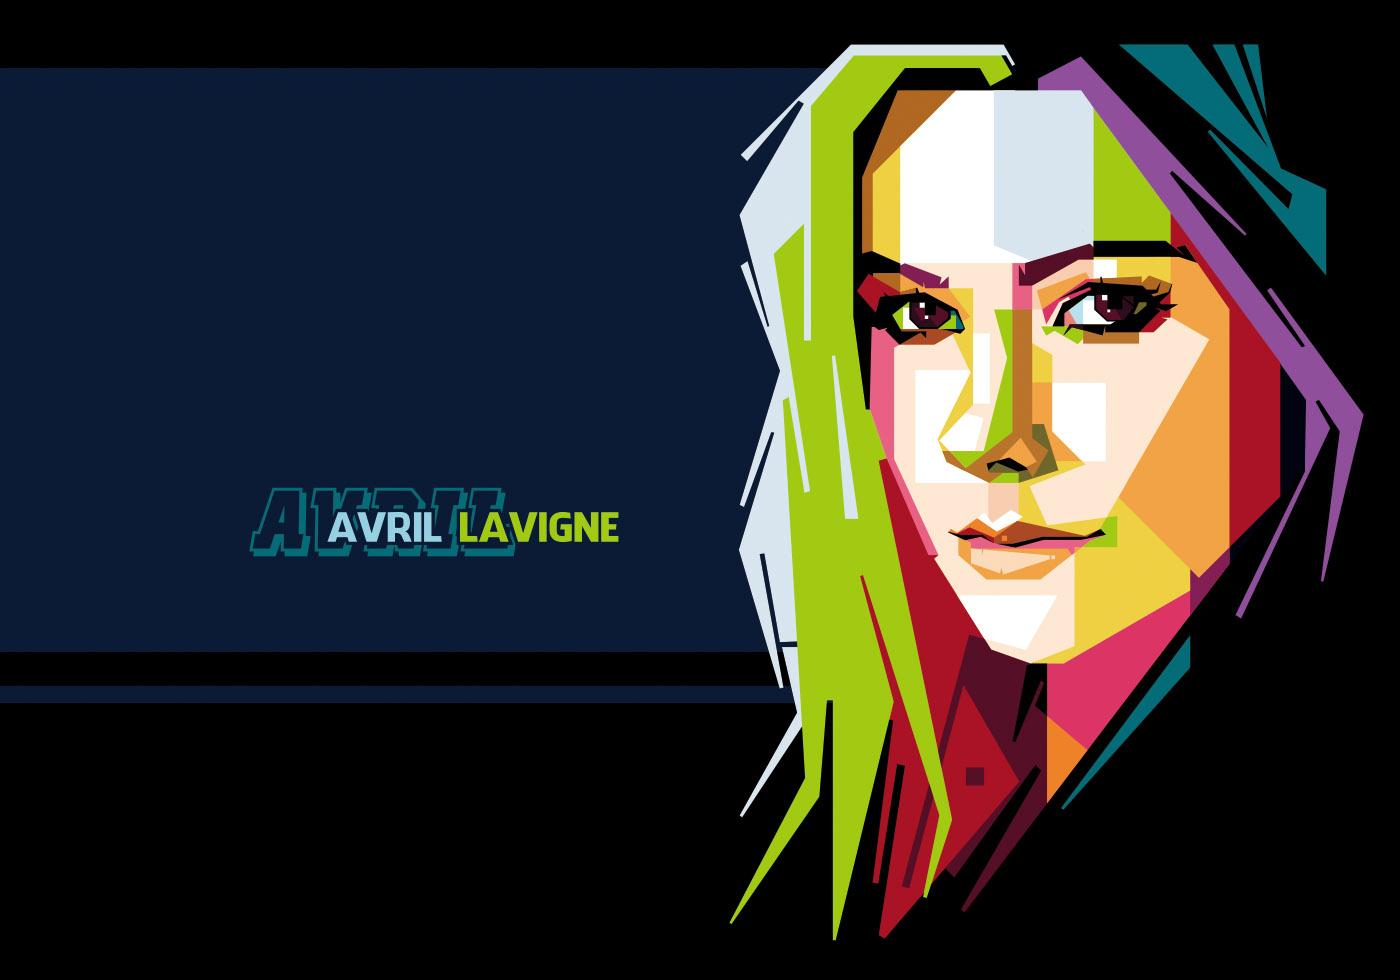 avril lavigne vector portrait download free vector art